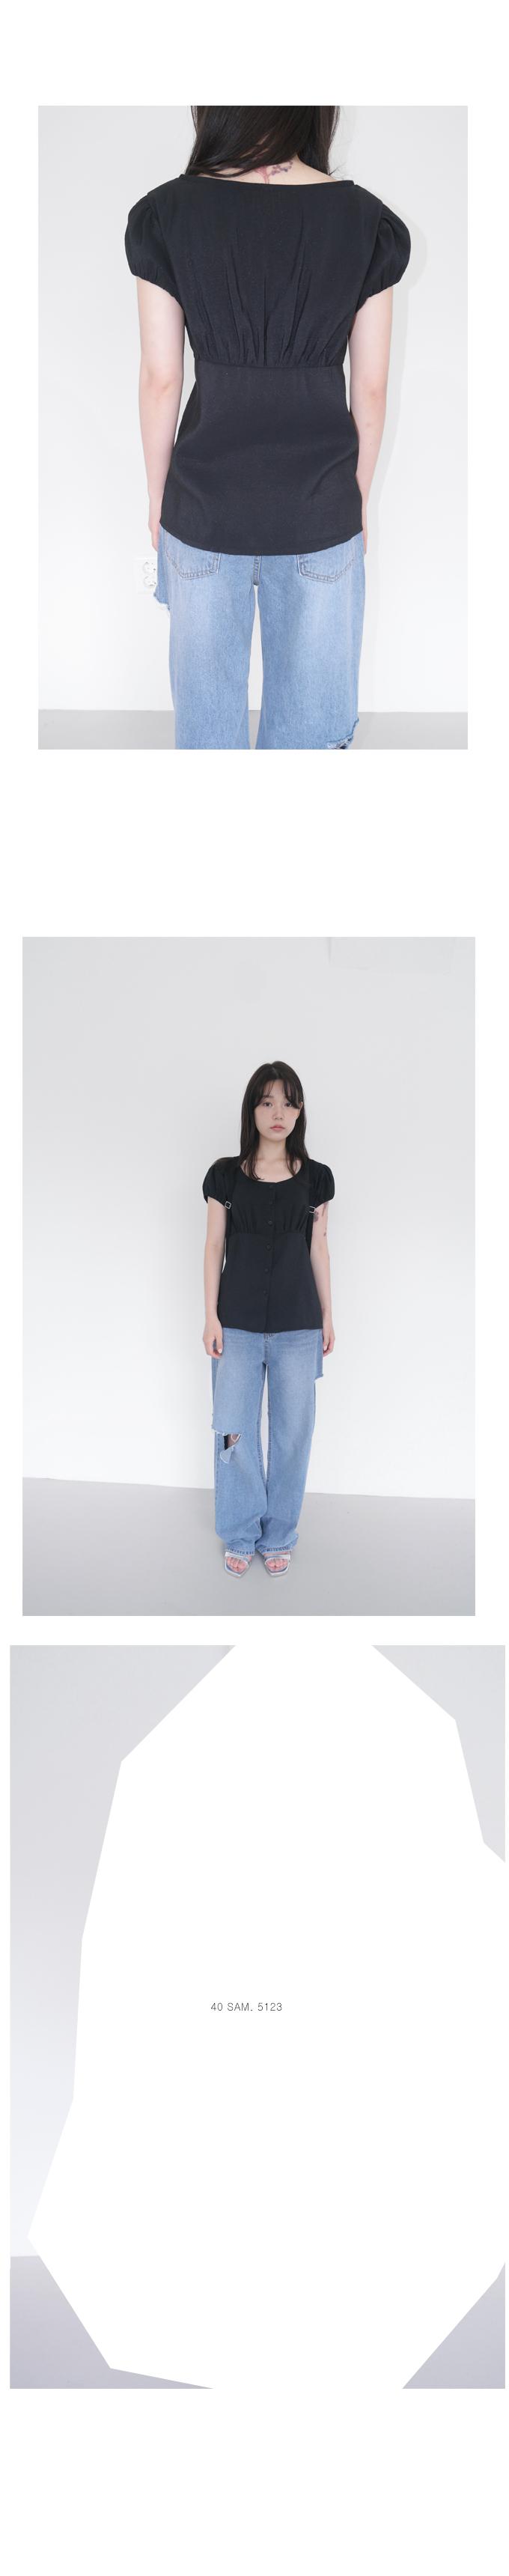 amusing cut-off jeans